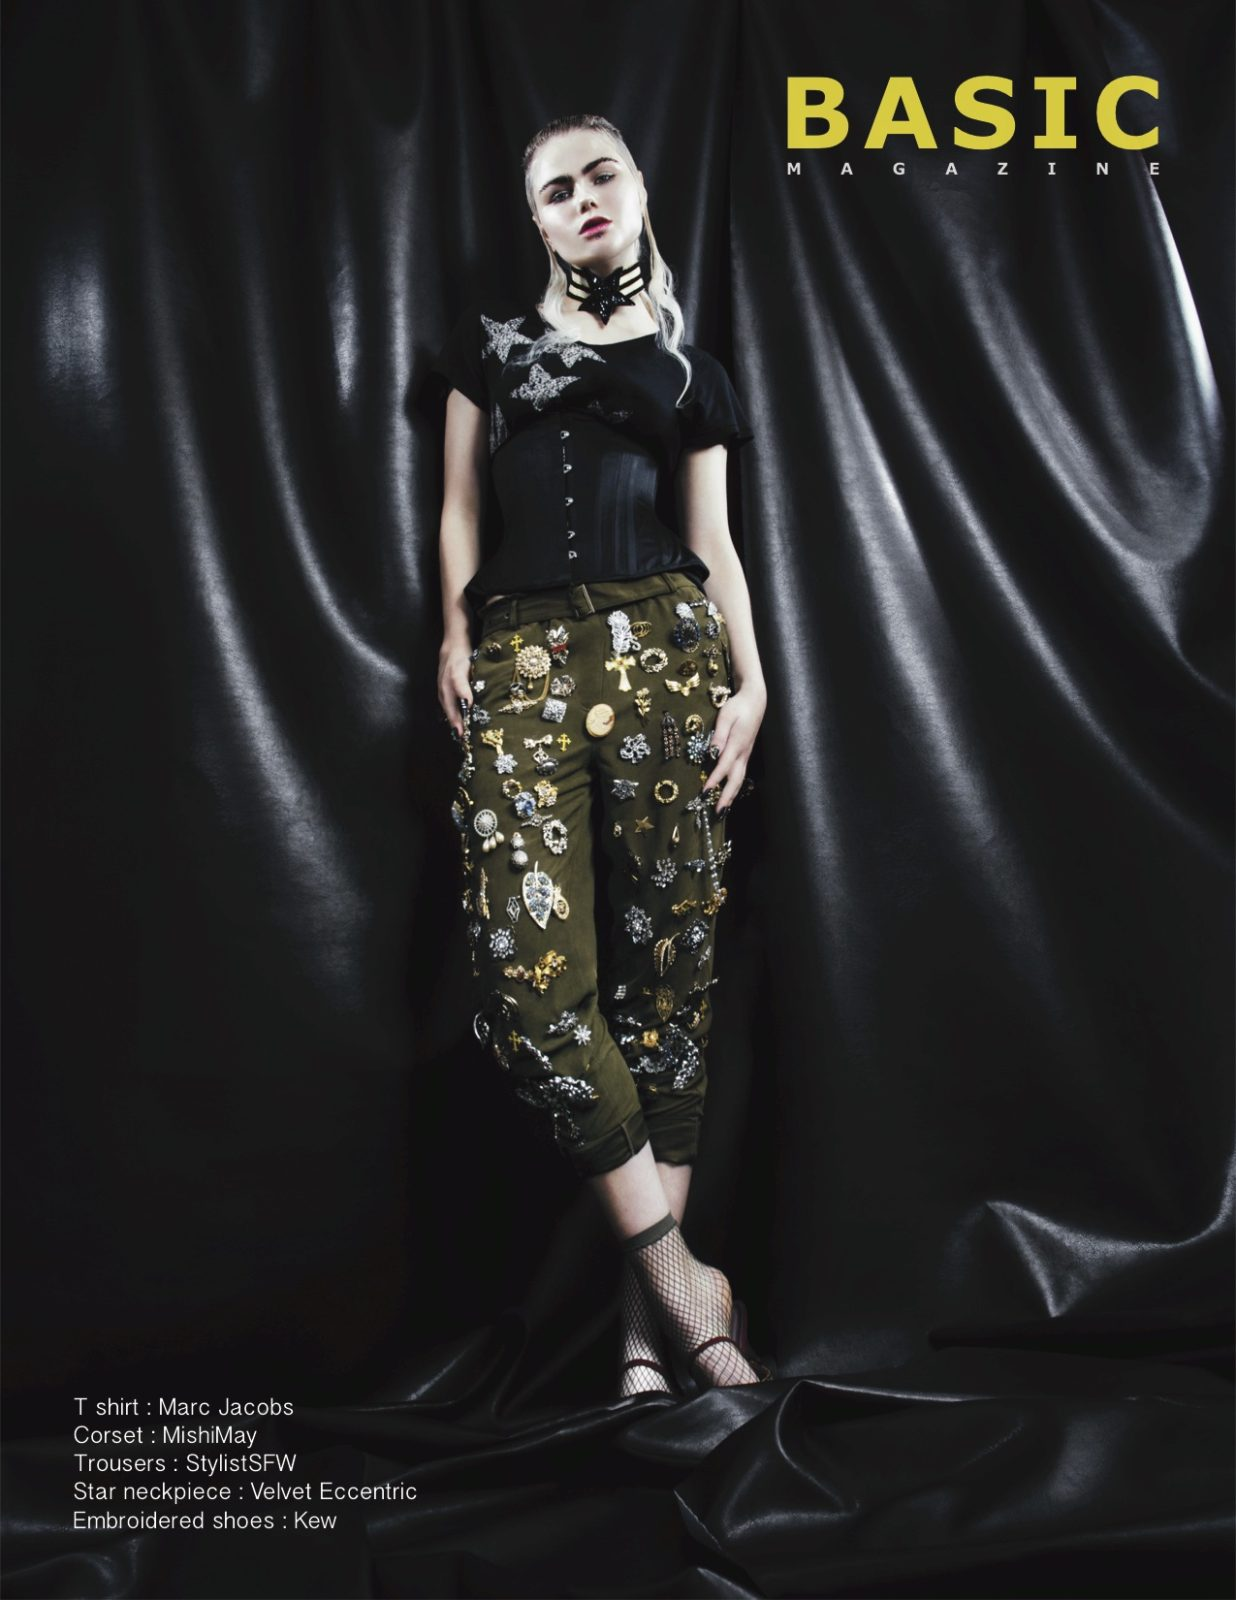 basic-magazine_marina-dean-francis_09